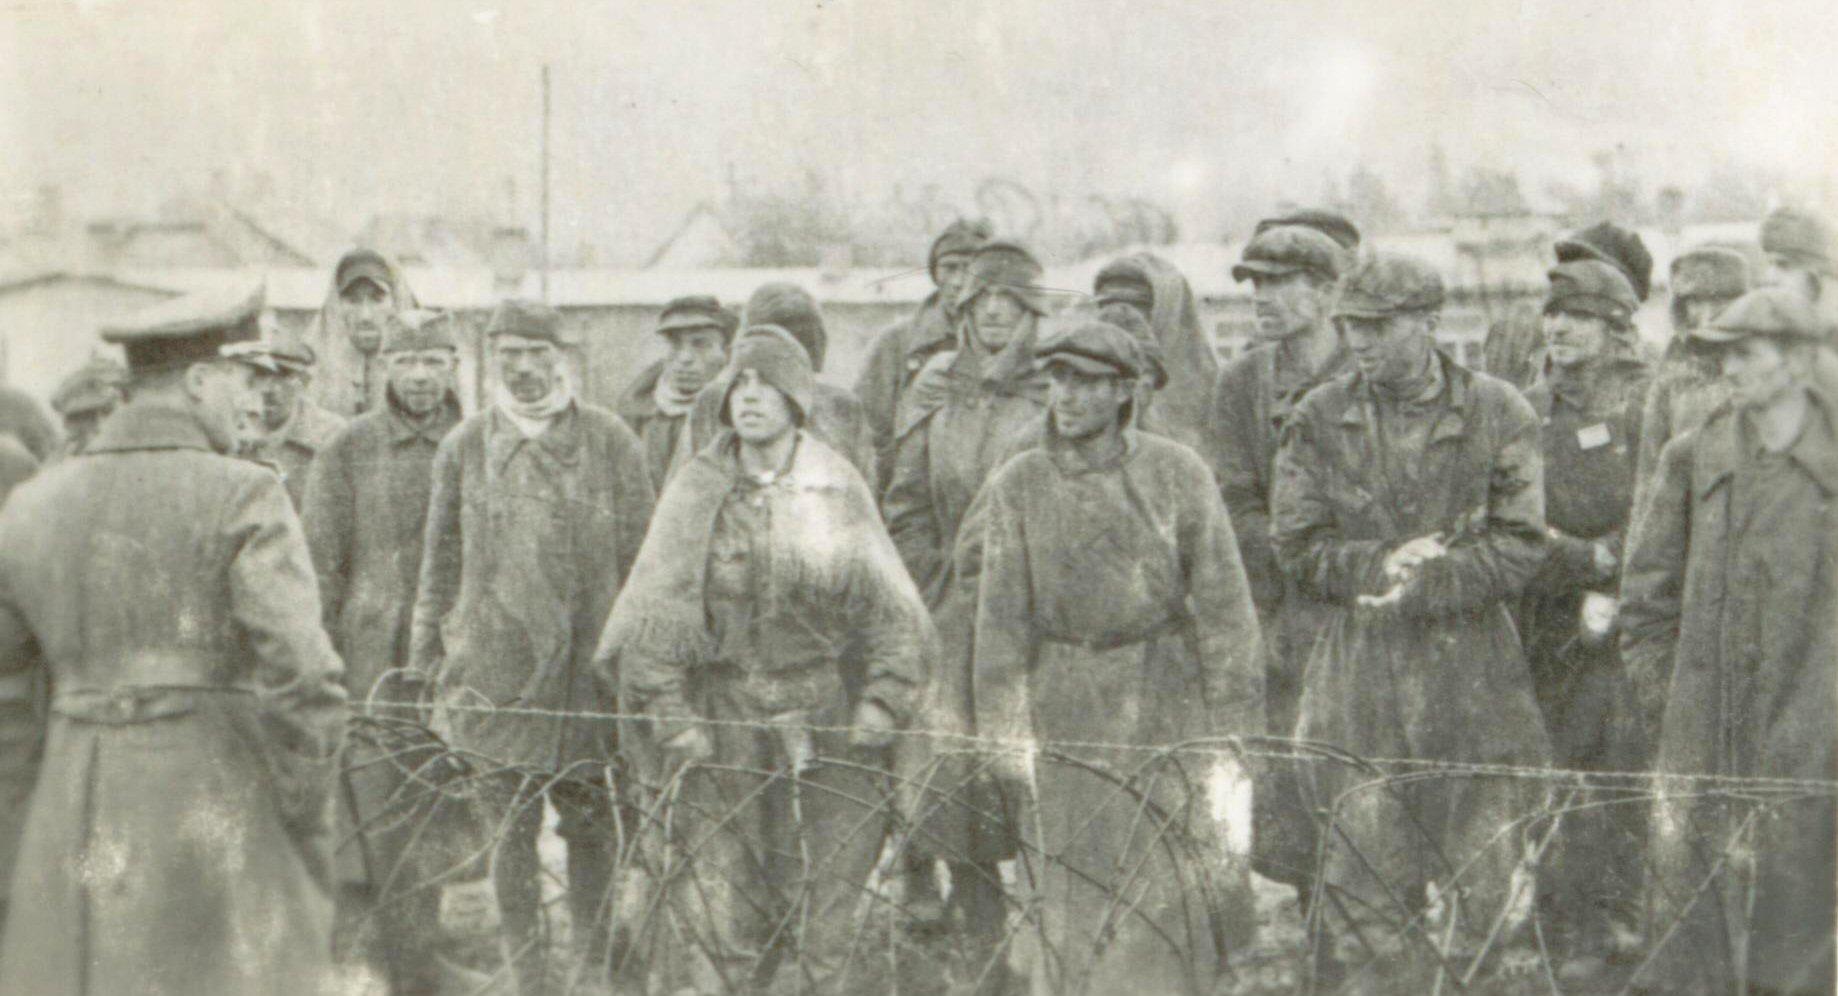 шталаг-18А -4 -русские